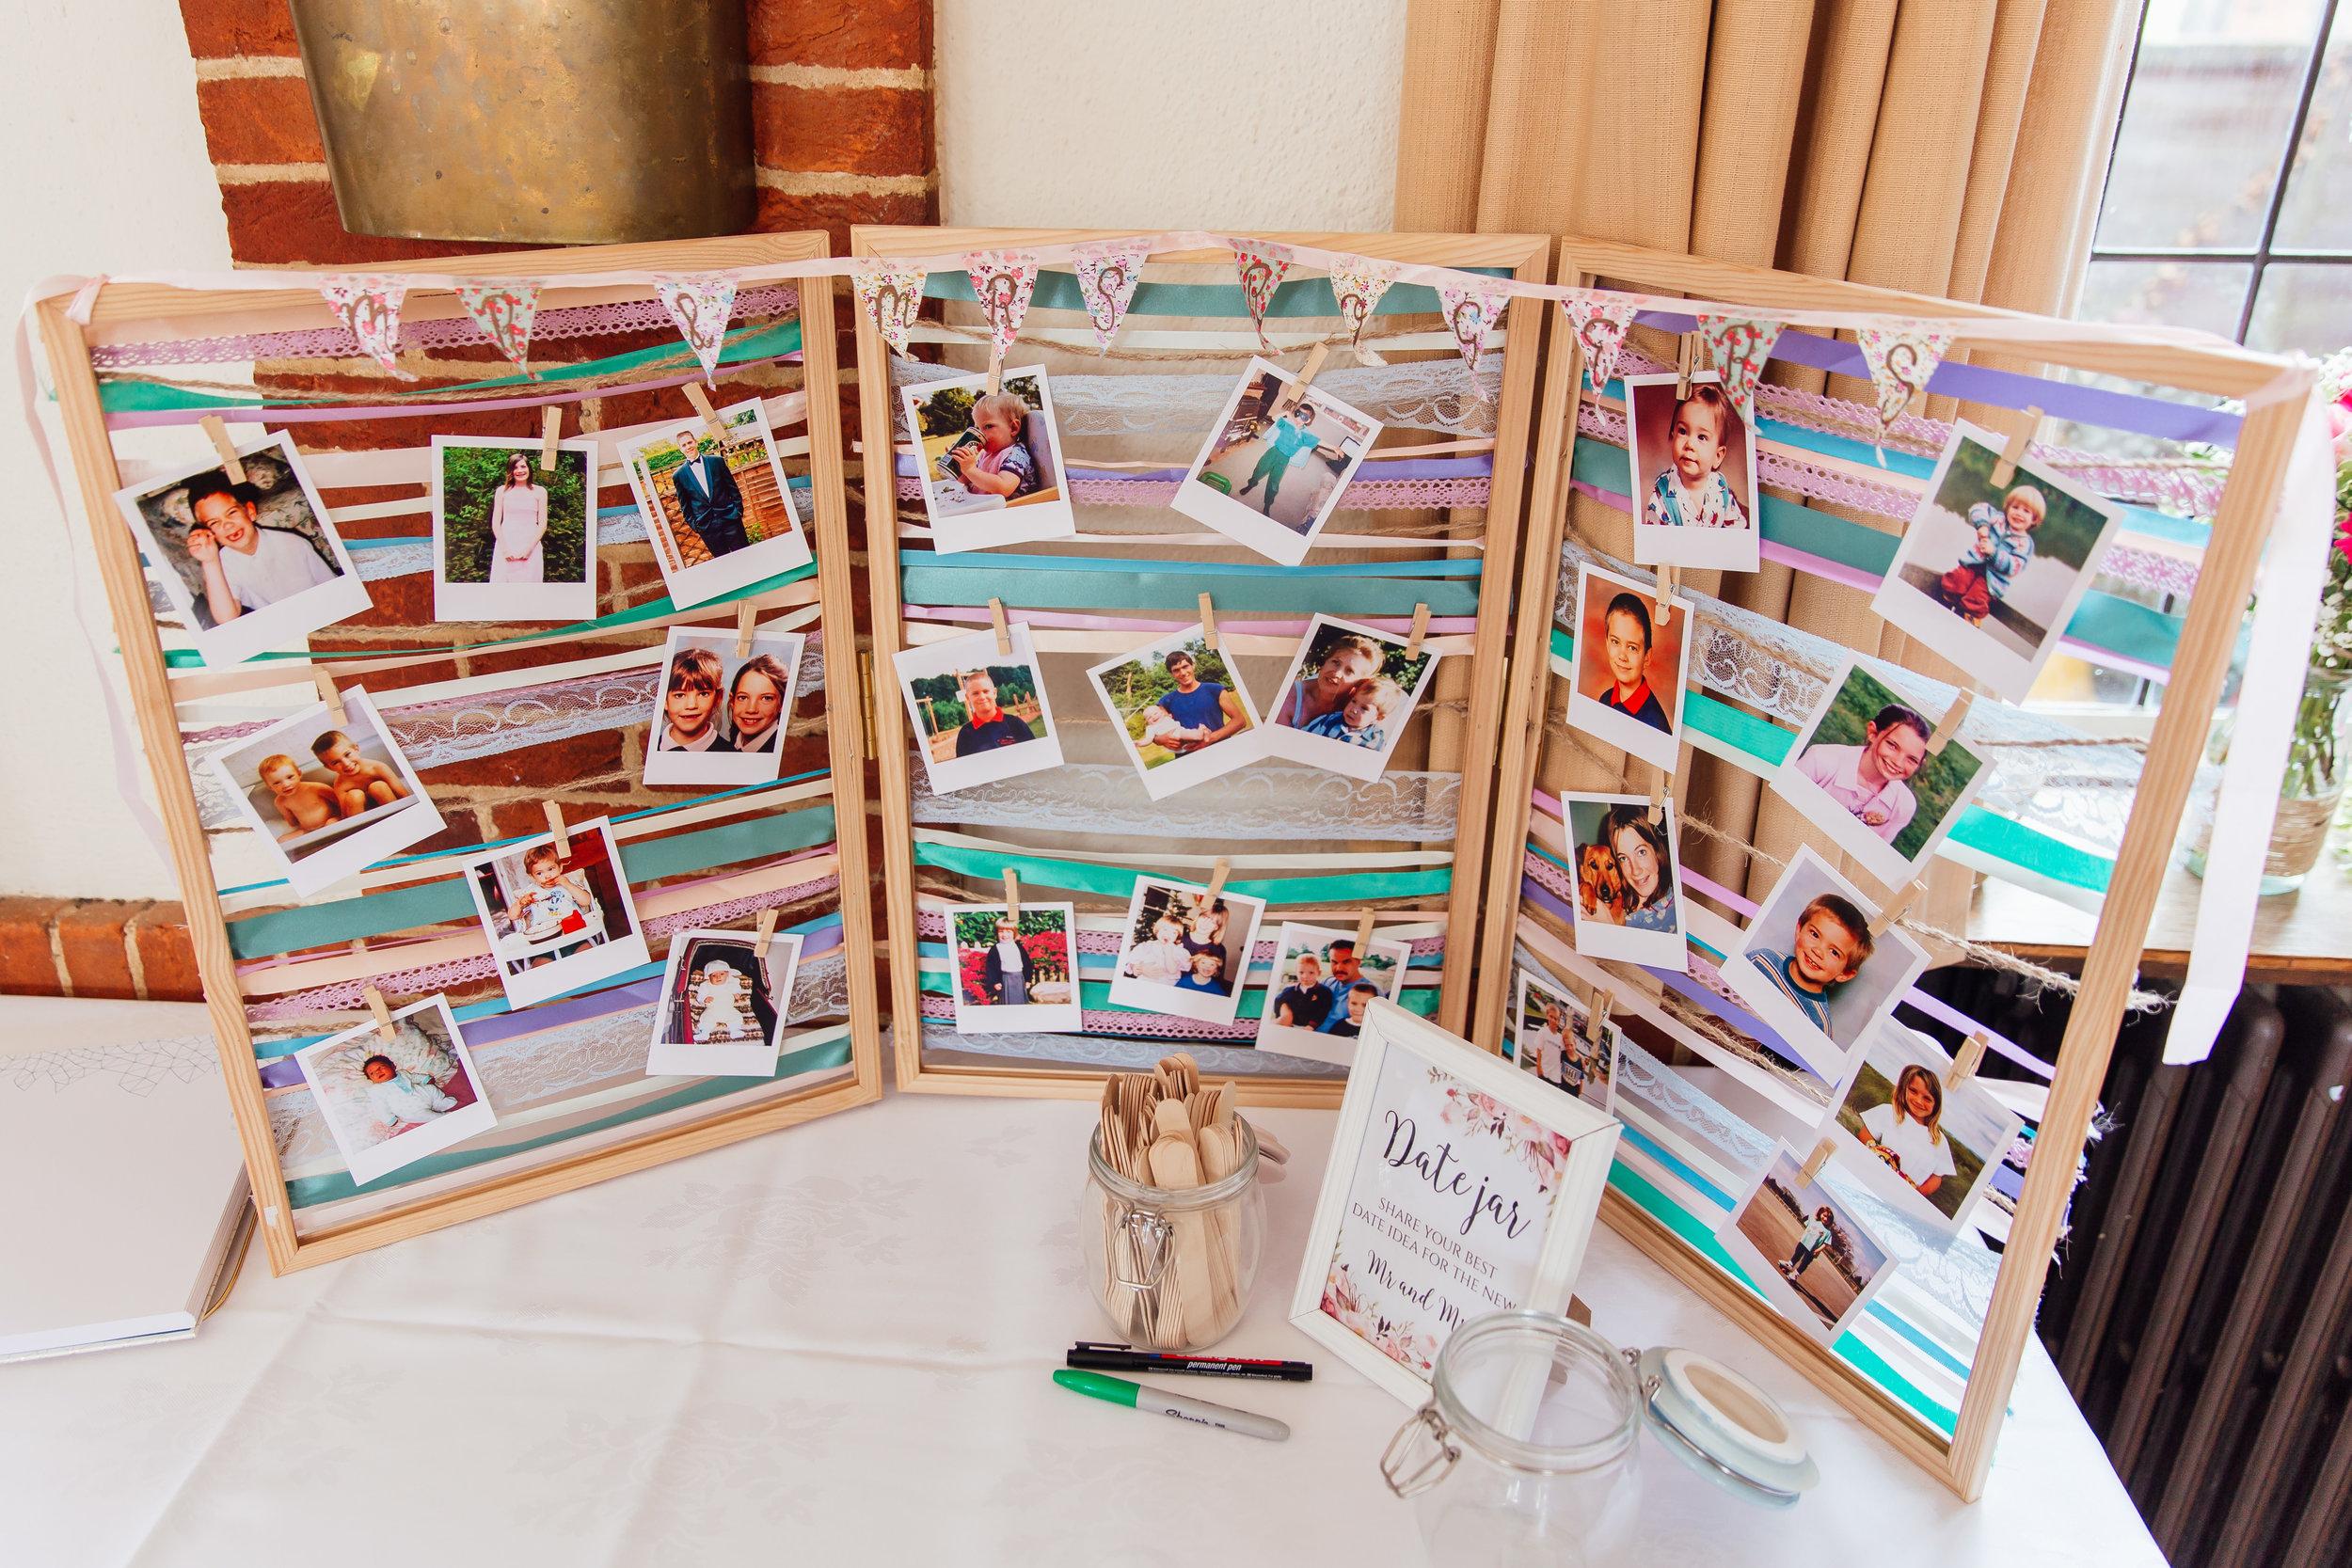 hampsire-wedding-photographer-hampshire / rotherwick-village-hall-wedding-reception-hampshire / amy-james-photography / fleet-wedding-photographer / village-hall-wedding